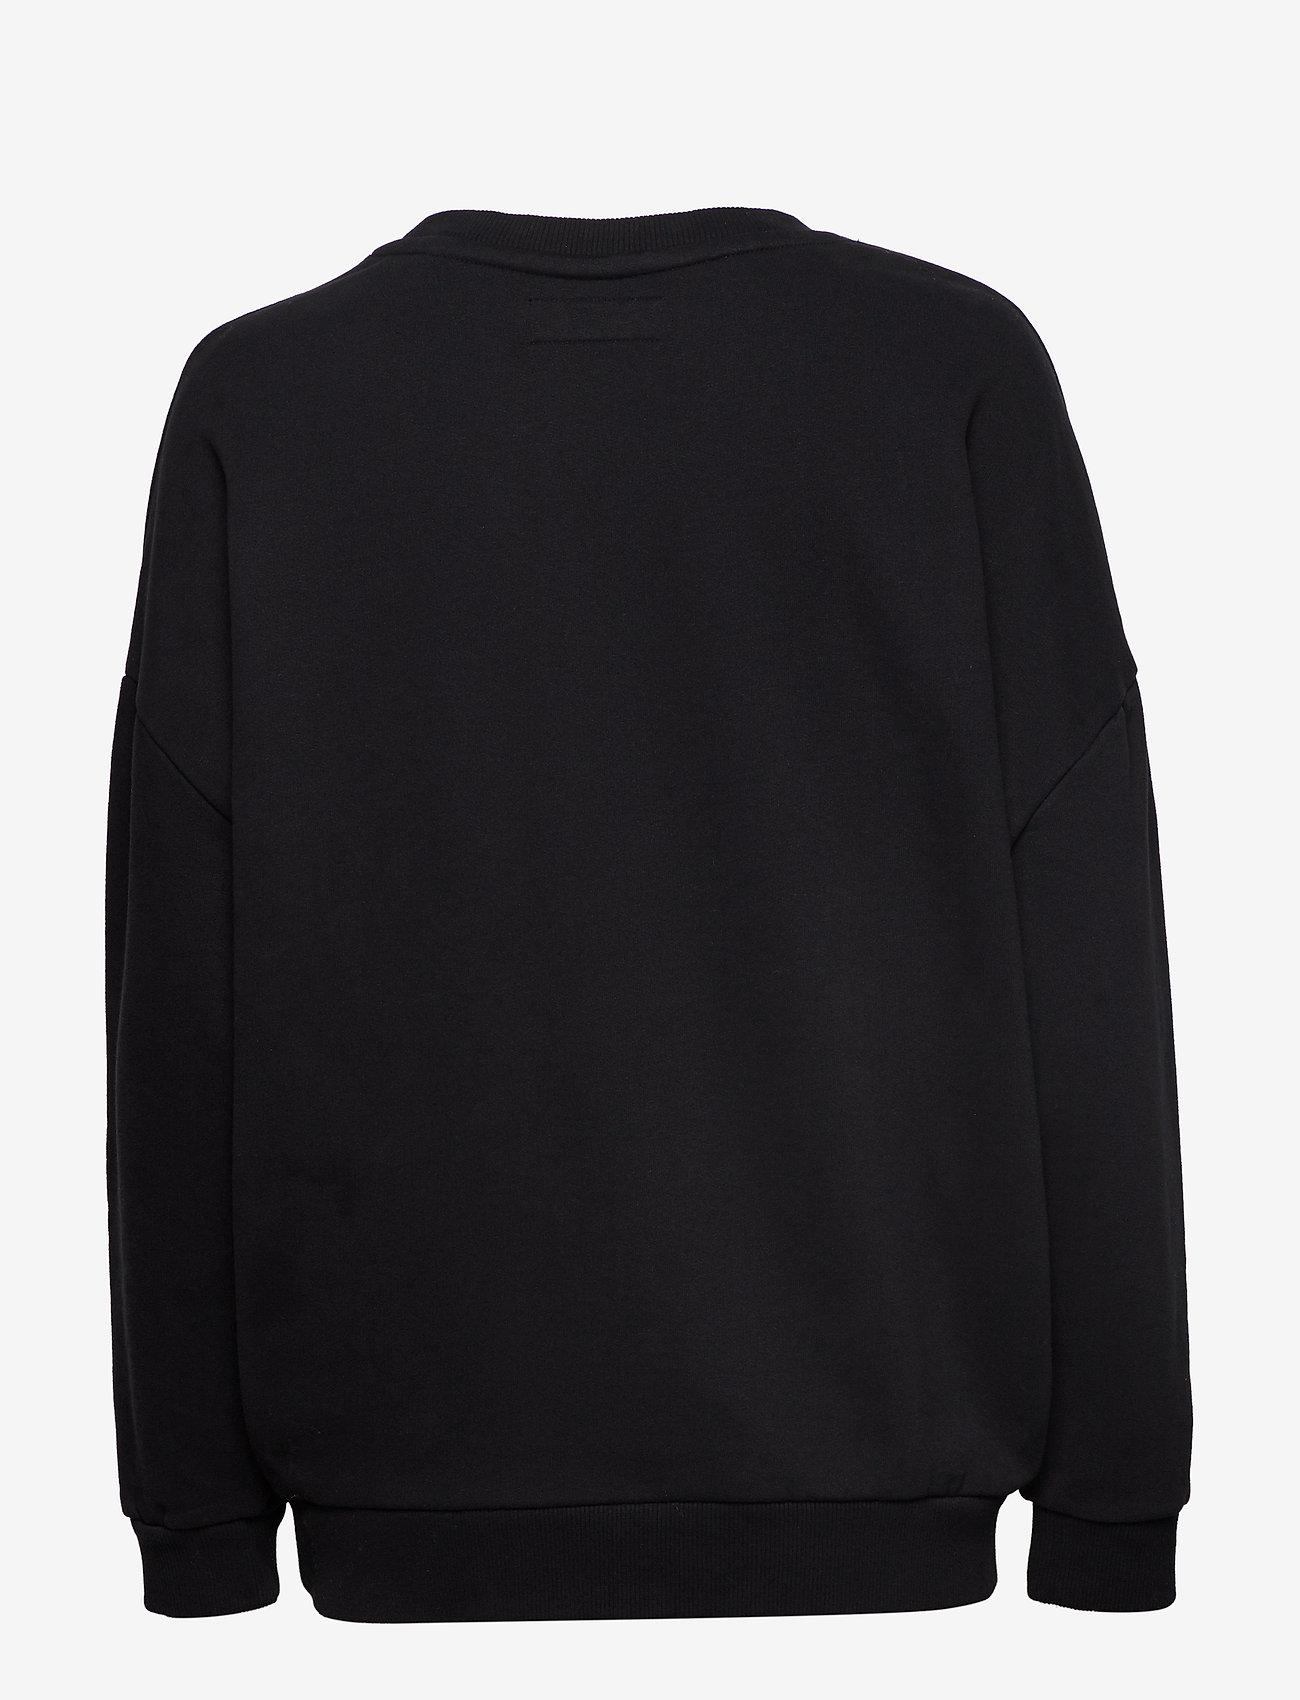 Superdry Jade Slouchy Crew - Sweatshirts